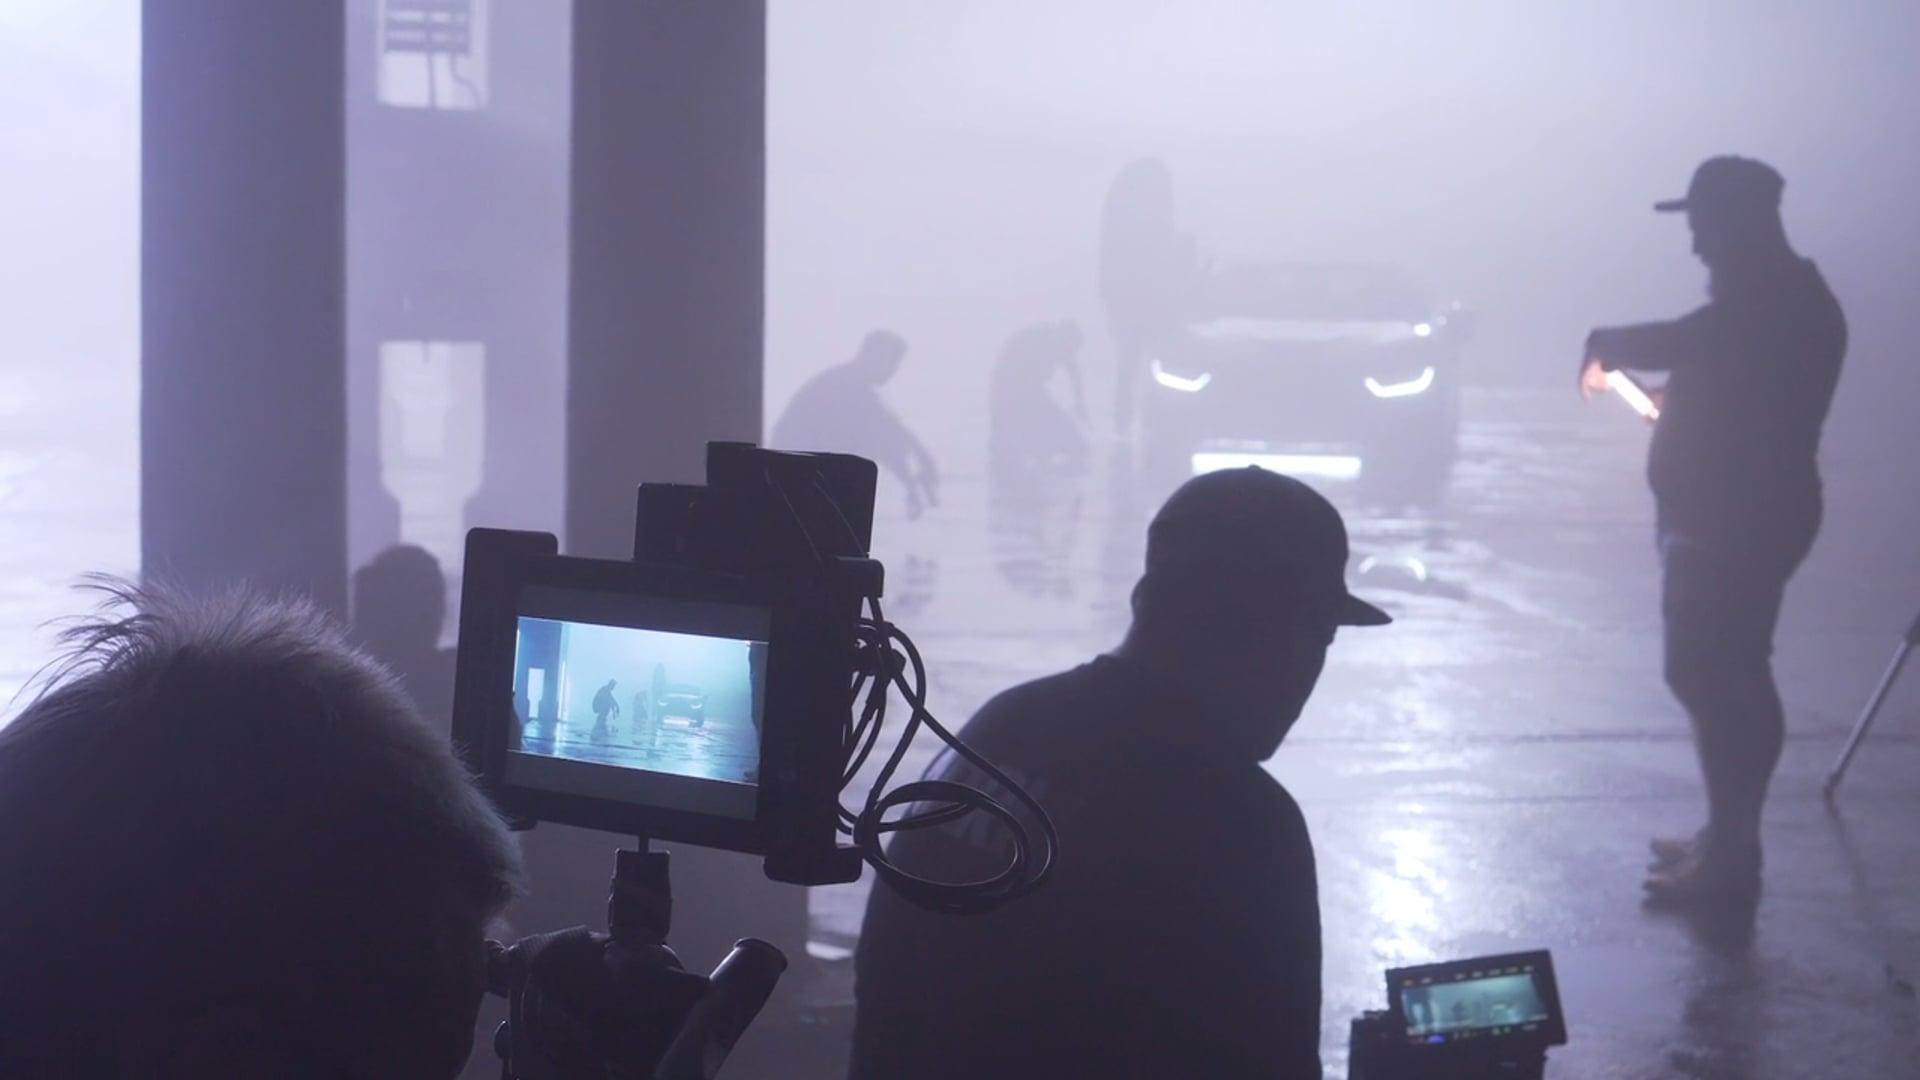 DEUCE FILM PRODUCTIONS - BMW BTS FILM